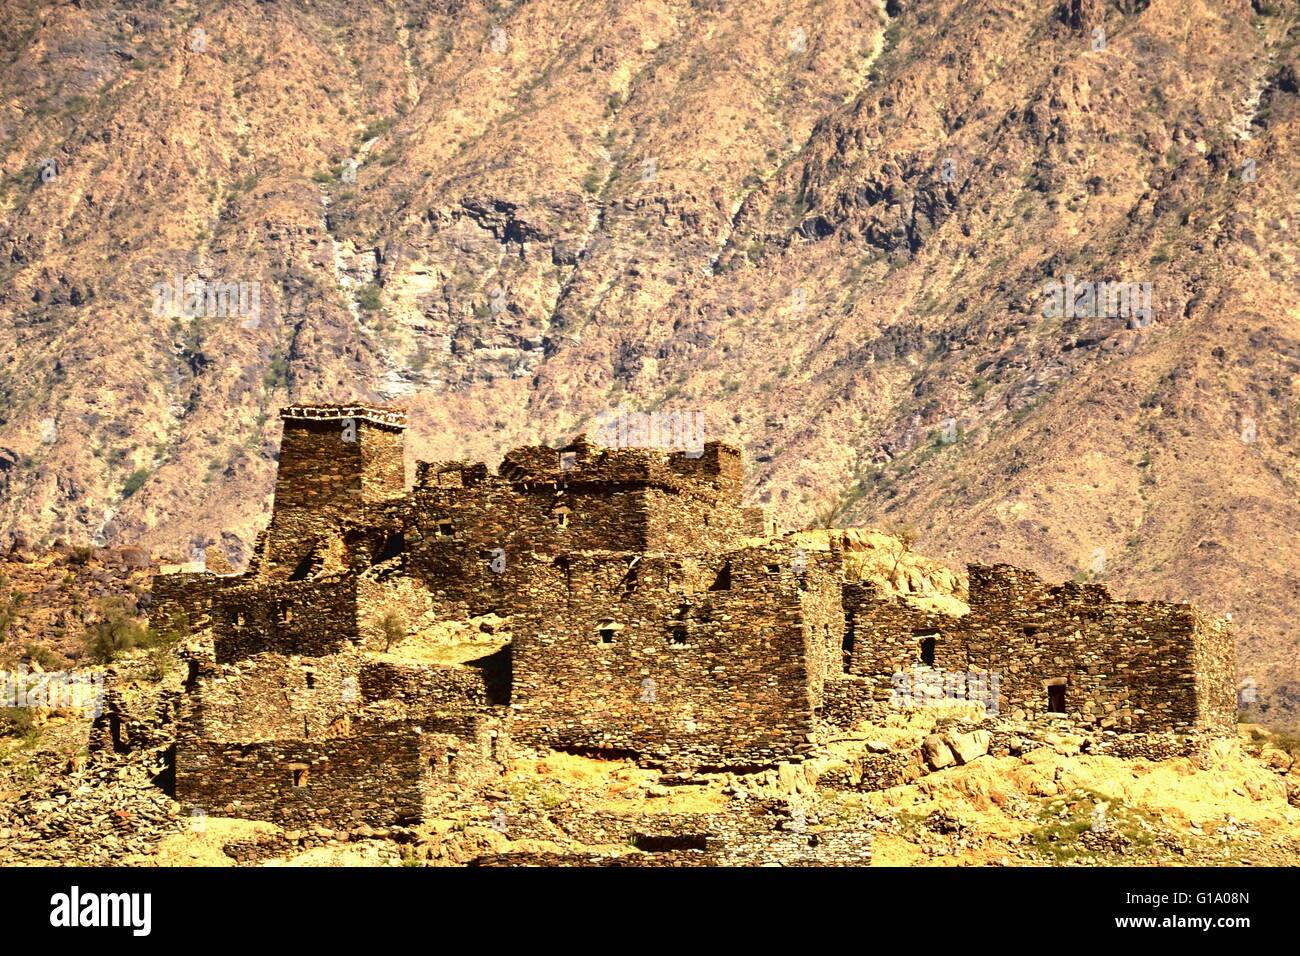 The Legend City, Thee Ain Villages, Al Baha, Saudi Arabia. - Stock Image